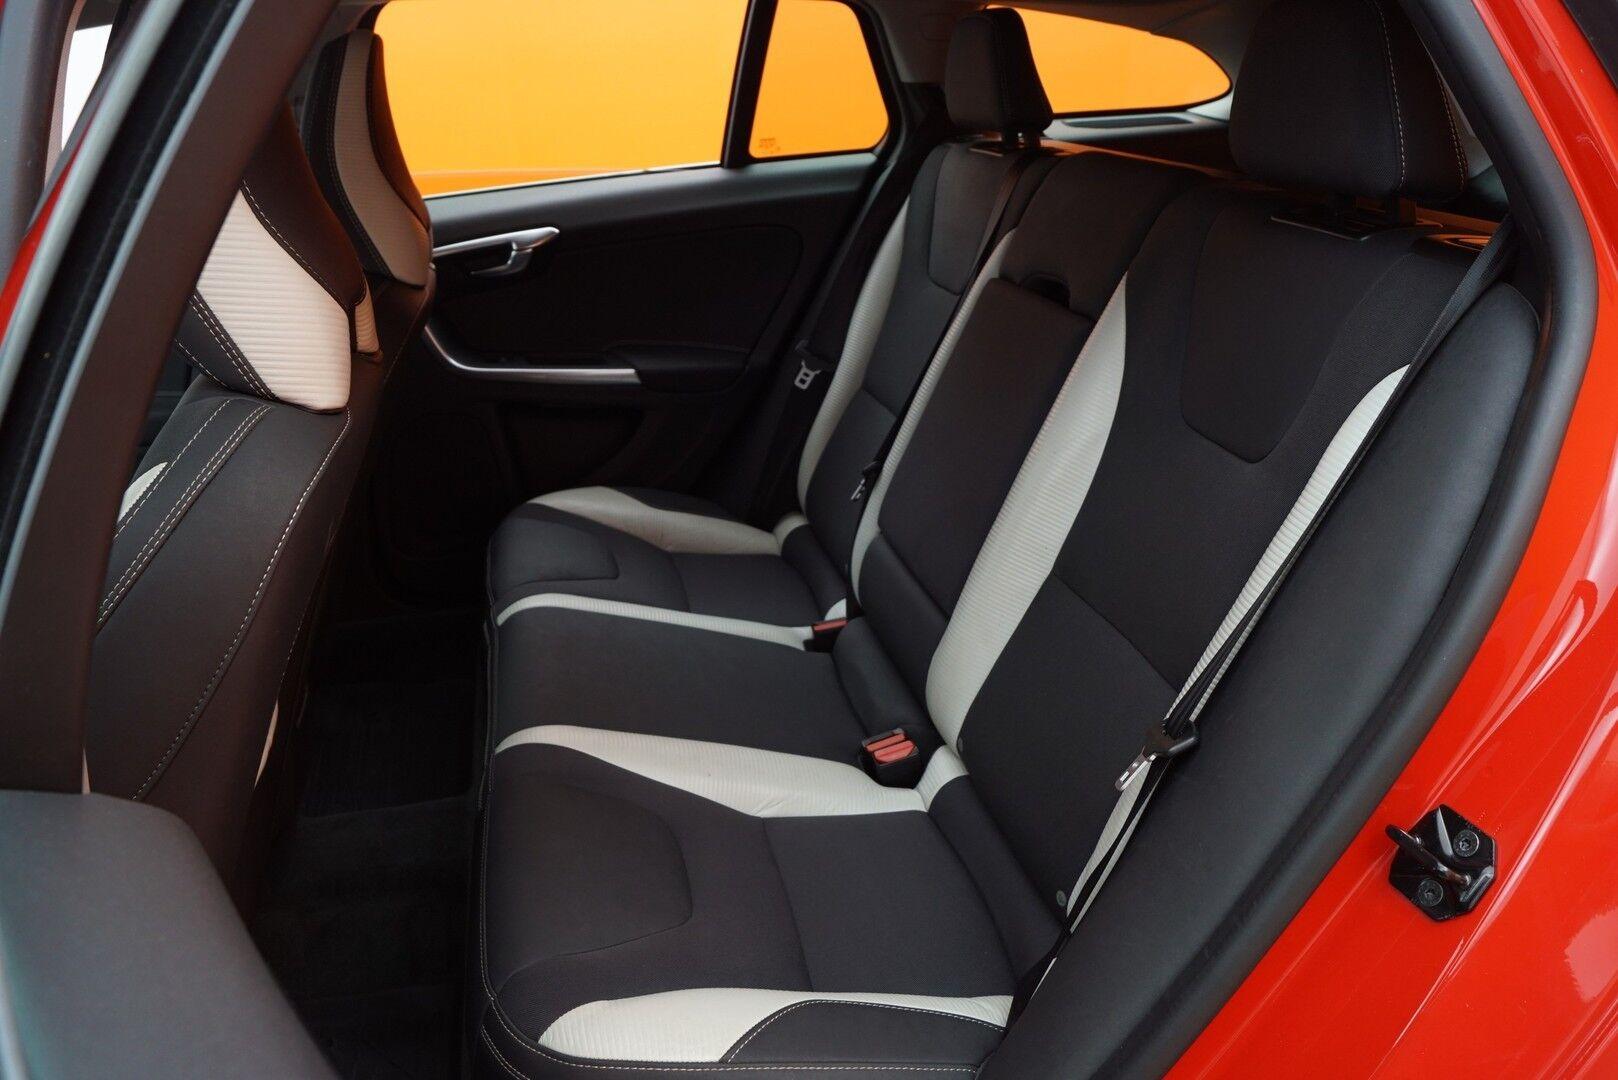 Punainen Farmari, Volvo V60 – HER-41097, kuva 13